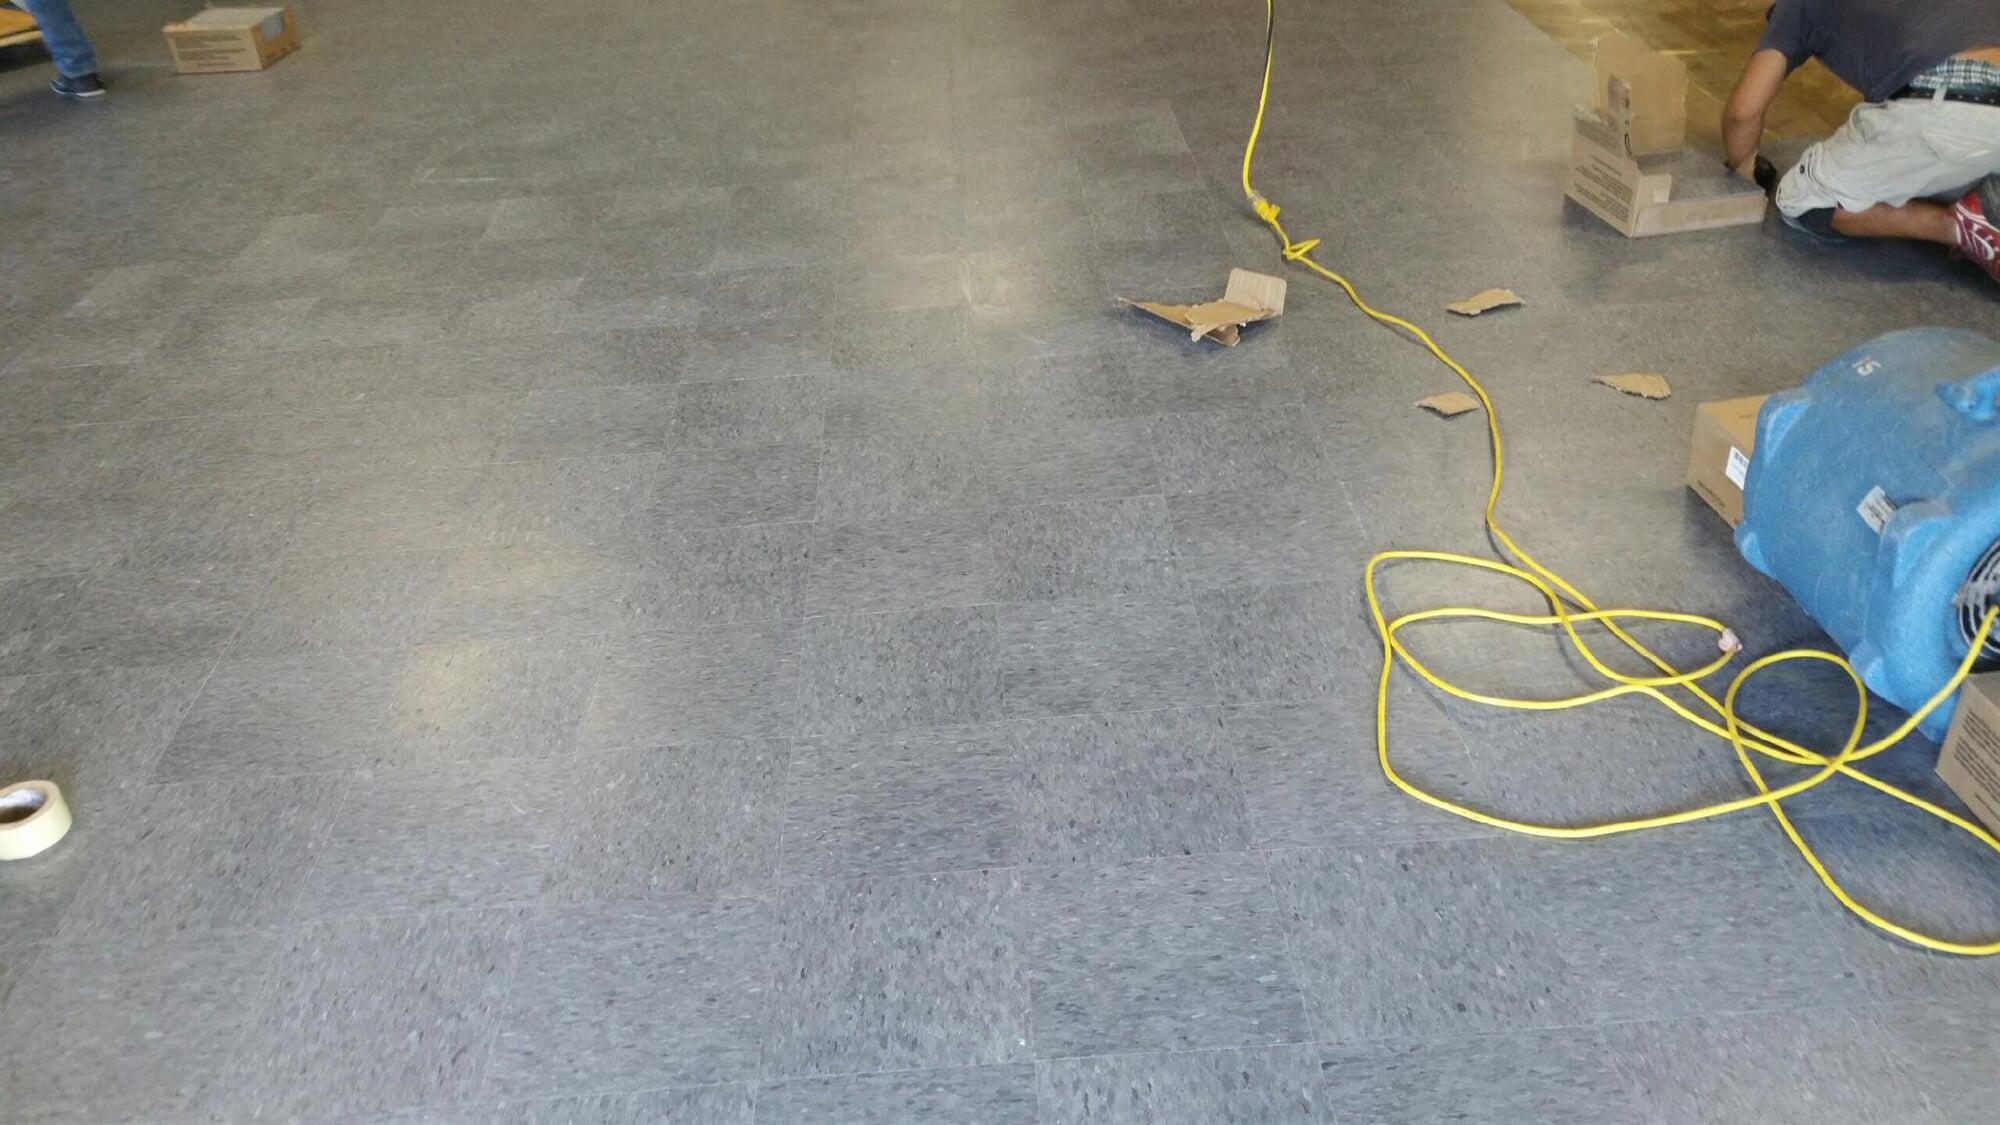 Tile flooring installation in progress from Carpets Unlimited